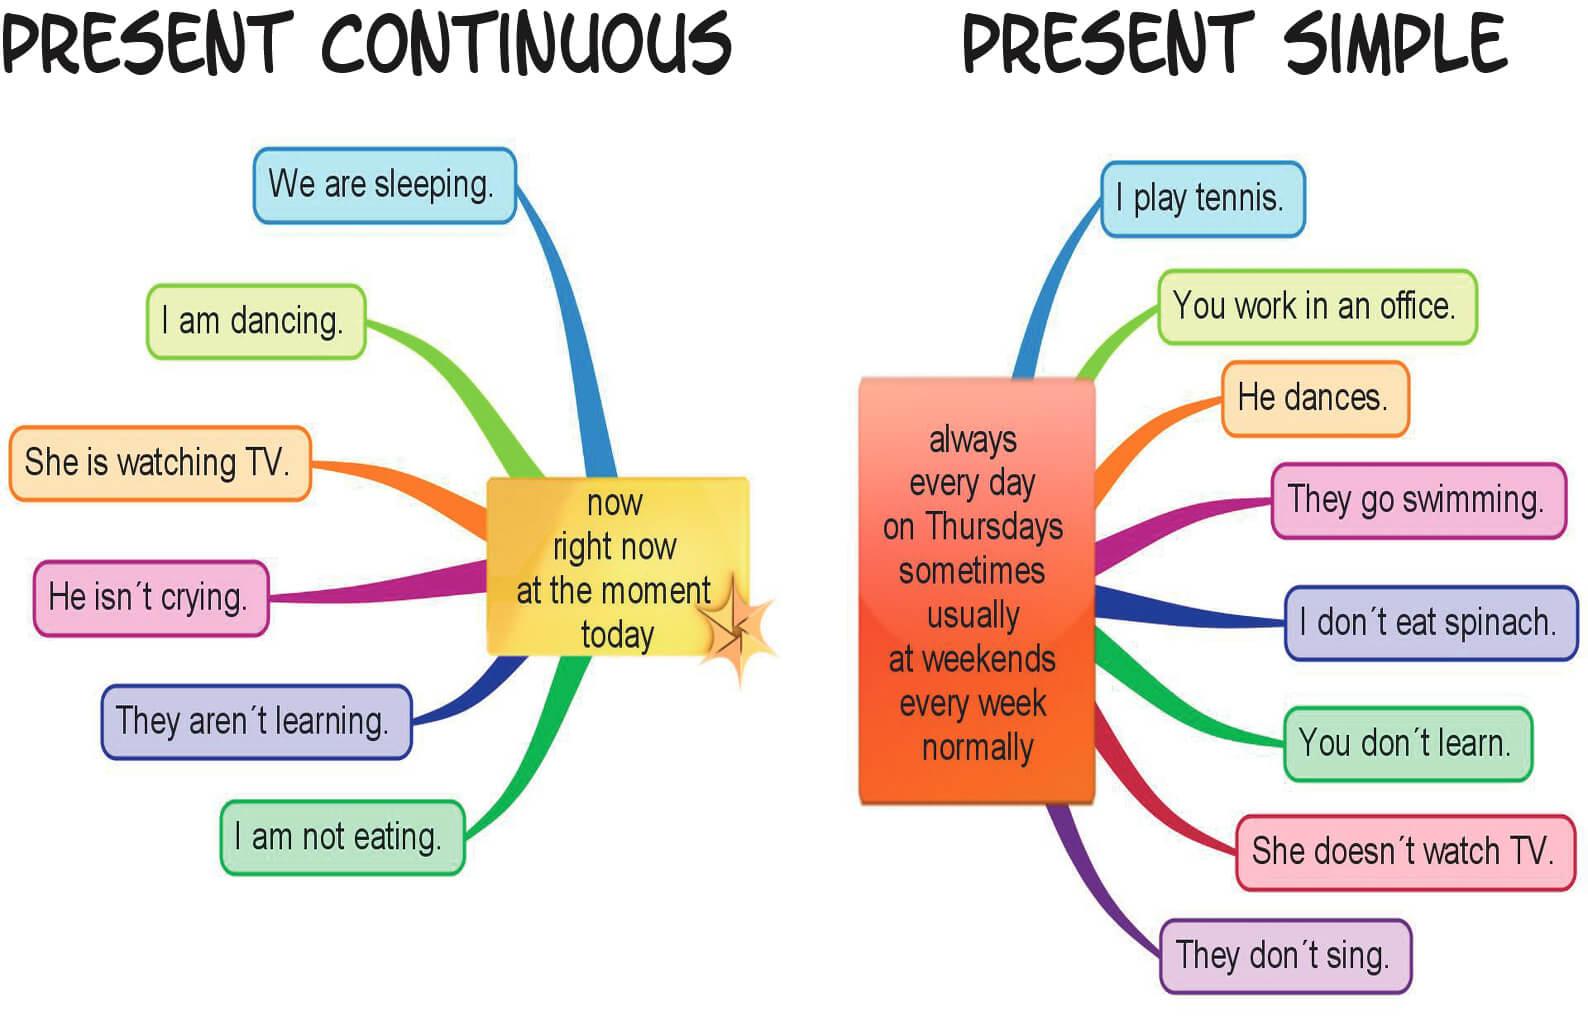 simple present x present continuous exercises pdf